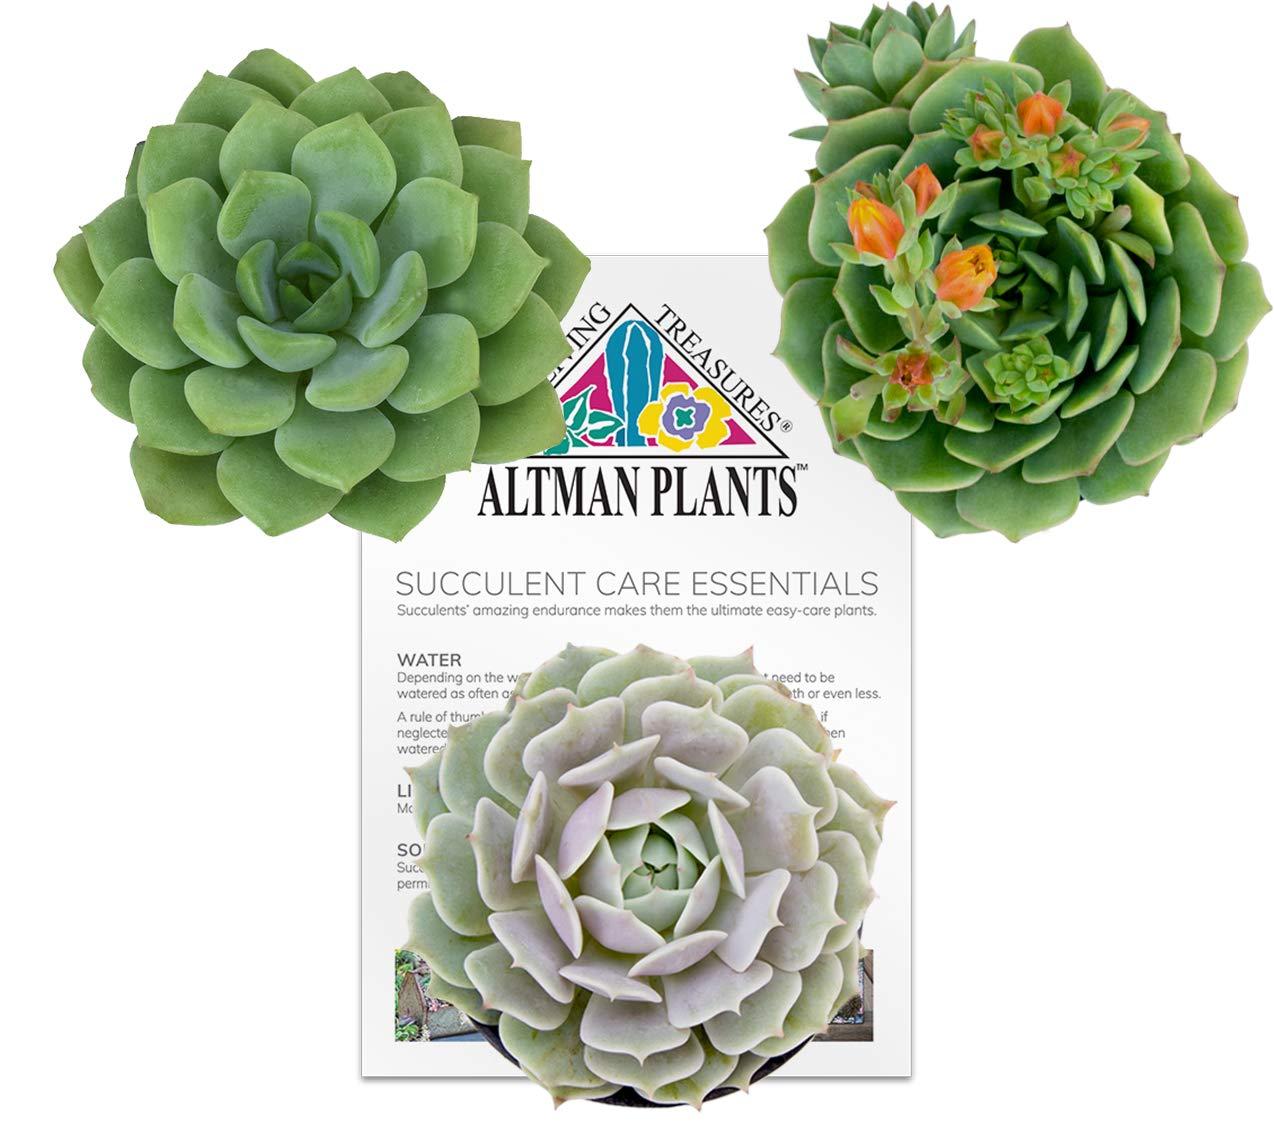 Altman Plants Assorted Live Succulents Flowering Rosette Collection Echeveria, sedeveria, perfect for party favors and arrangements, 3.5'', 3 Pack